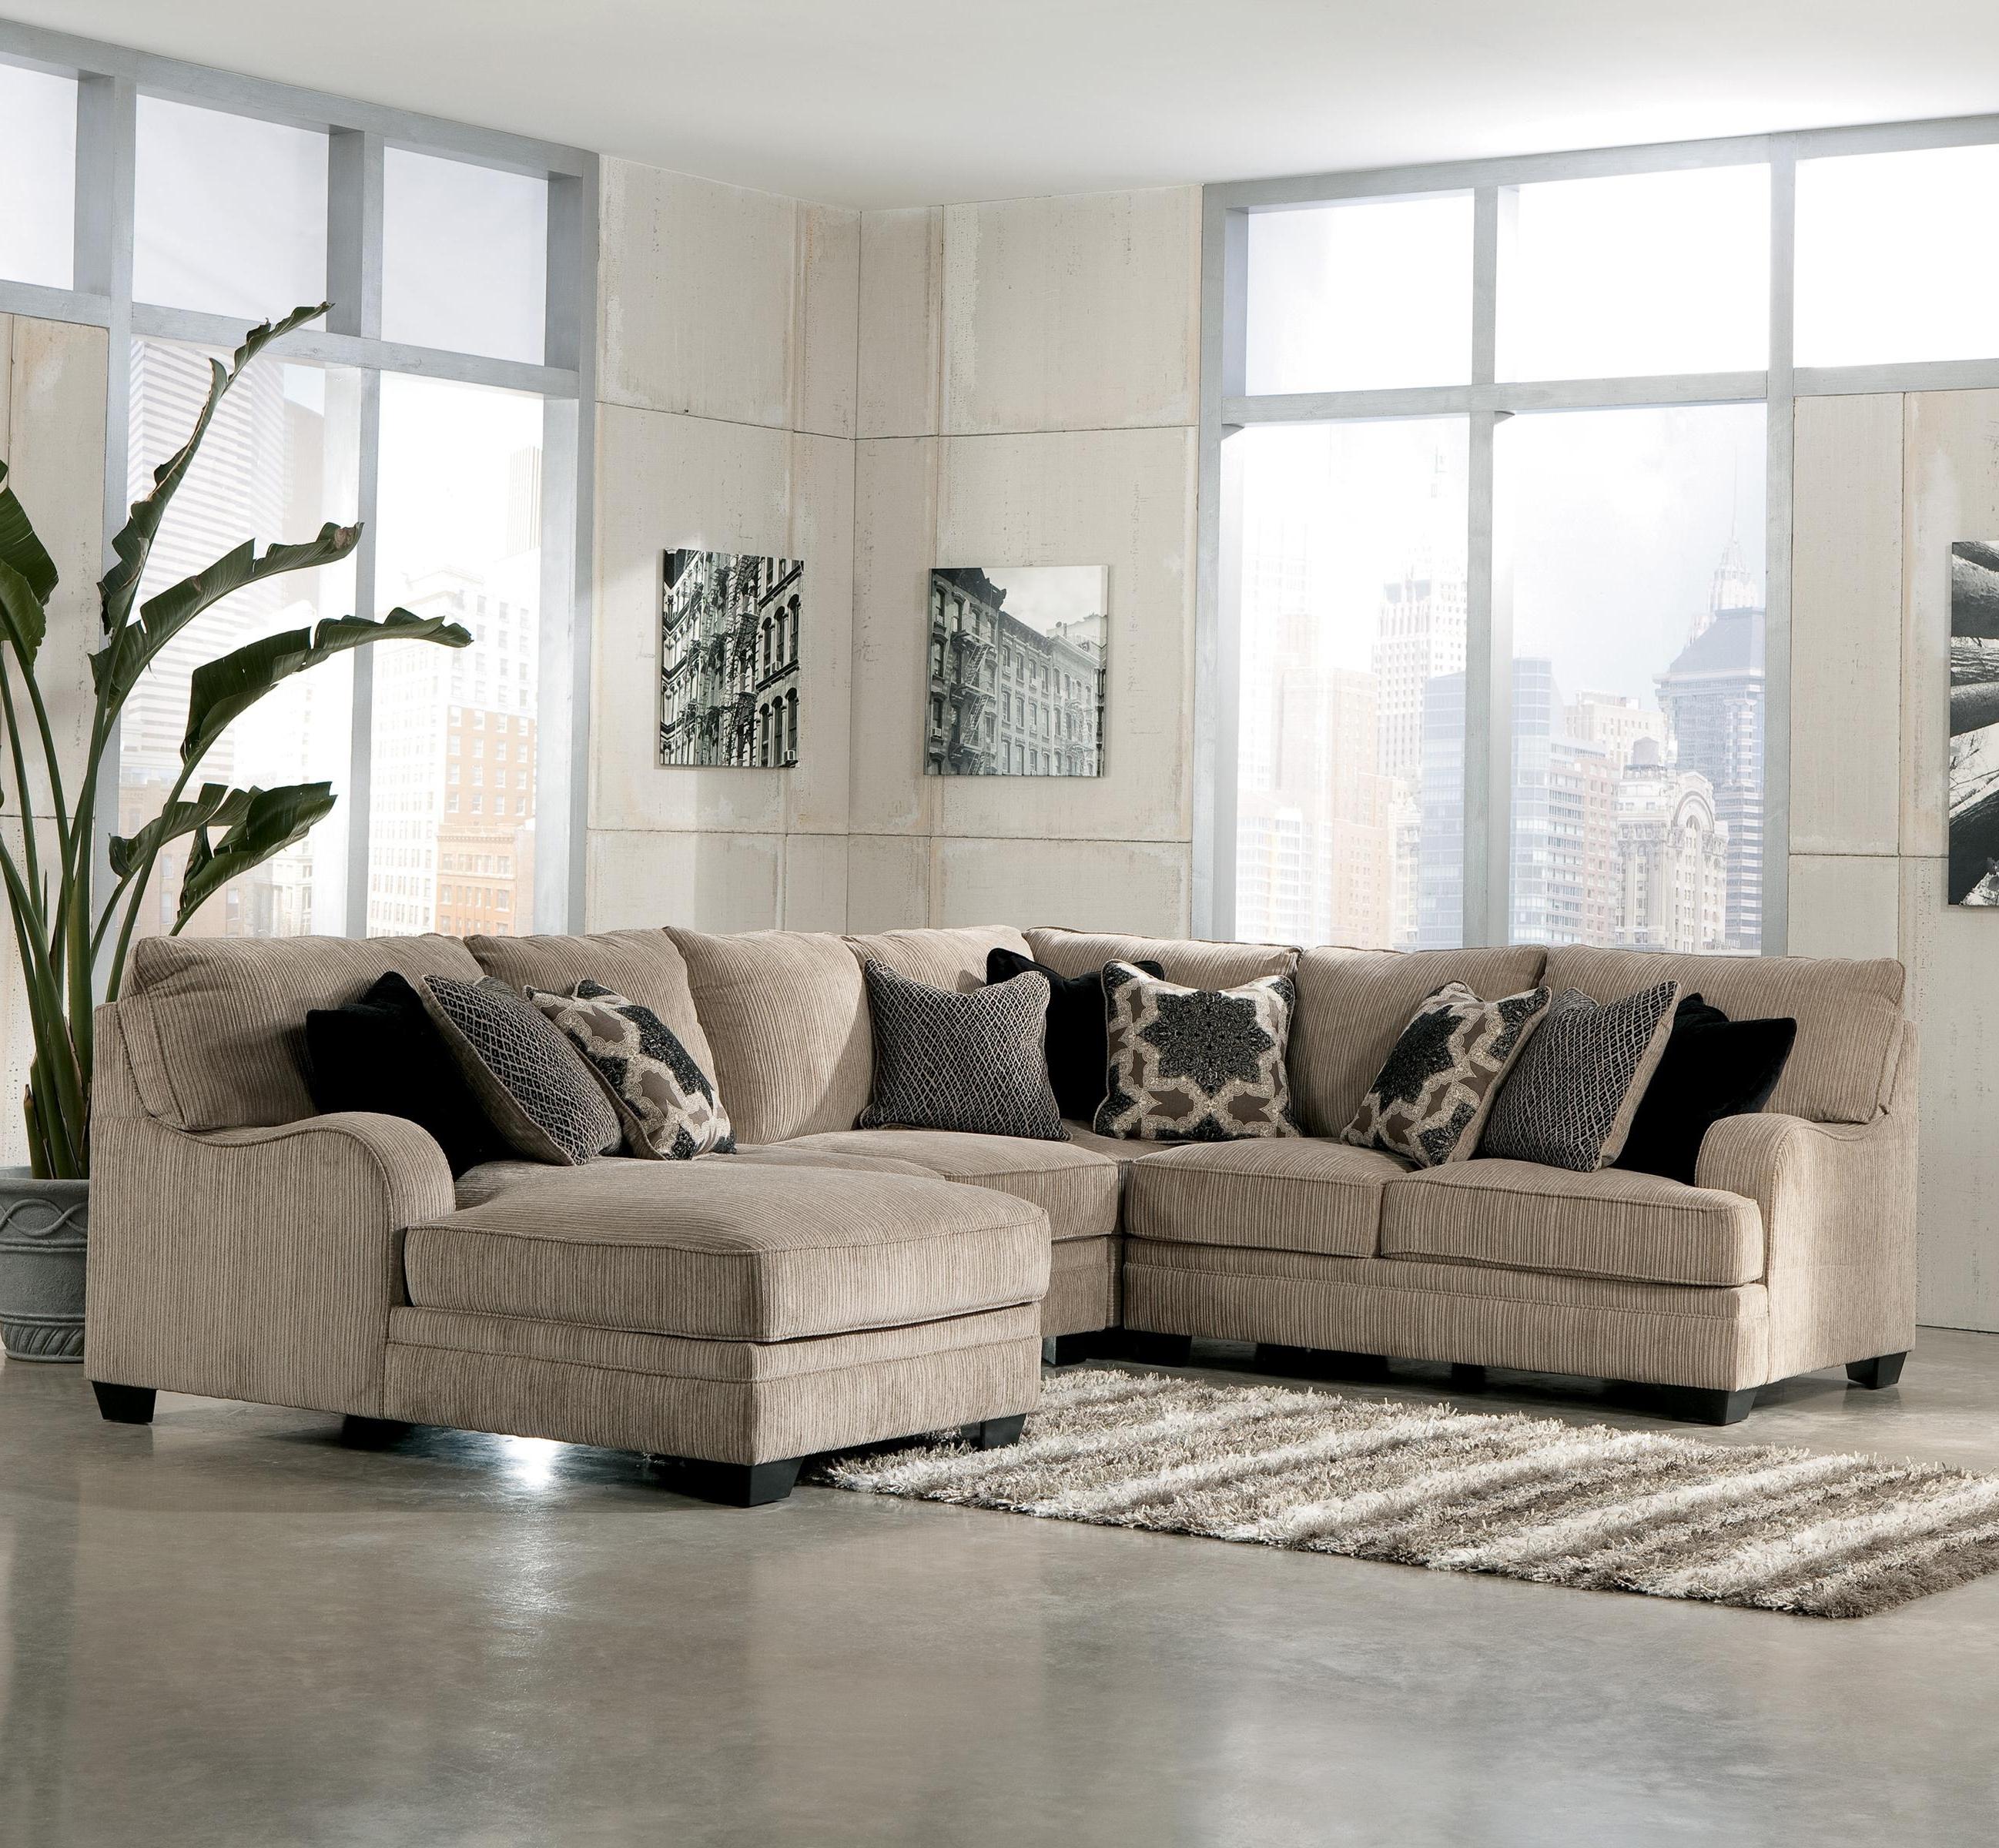 Signature Designashley Katisha – Platinum 4 Piece Sectional Regarding Trendy Killeen Tx Sectional Sofas (View 18 of 20)